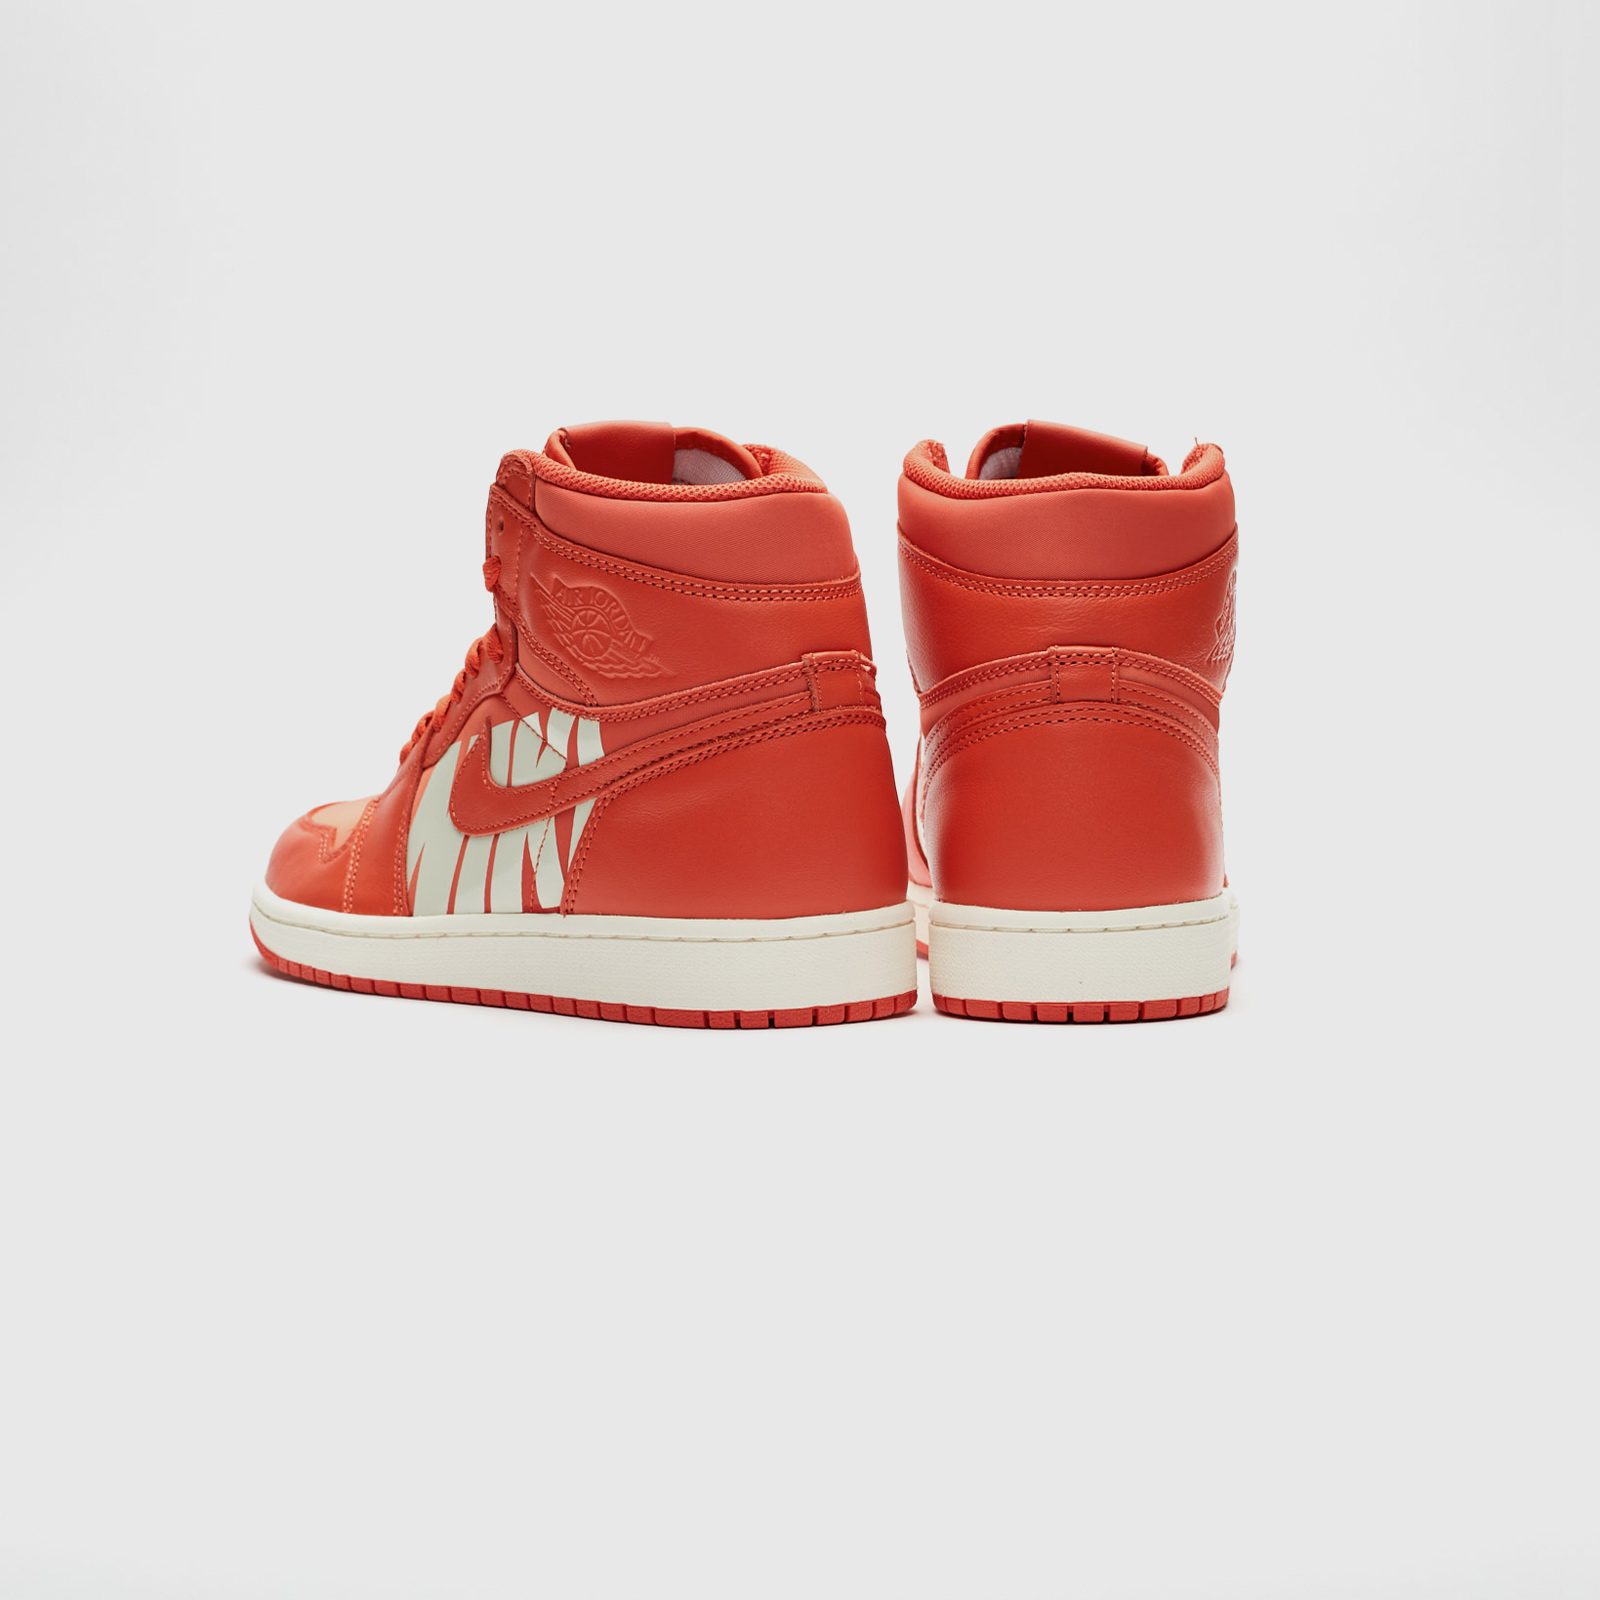 Jordan Brand Air Jordan 1 Retro High OG - 555088-800 ... 7c558120d